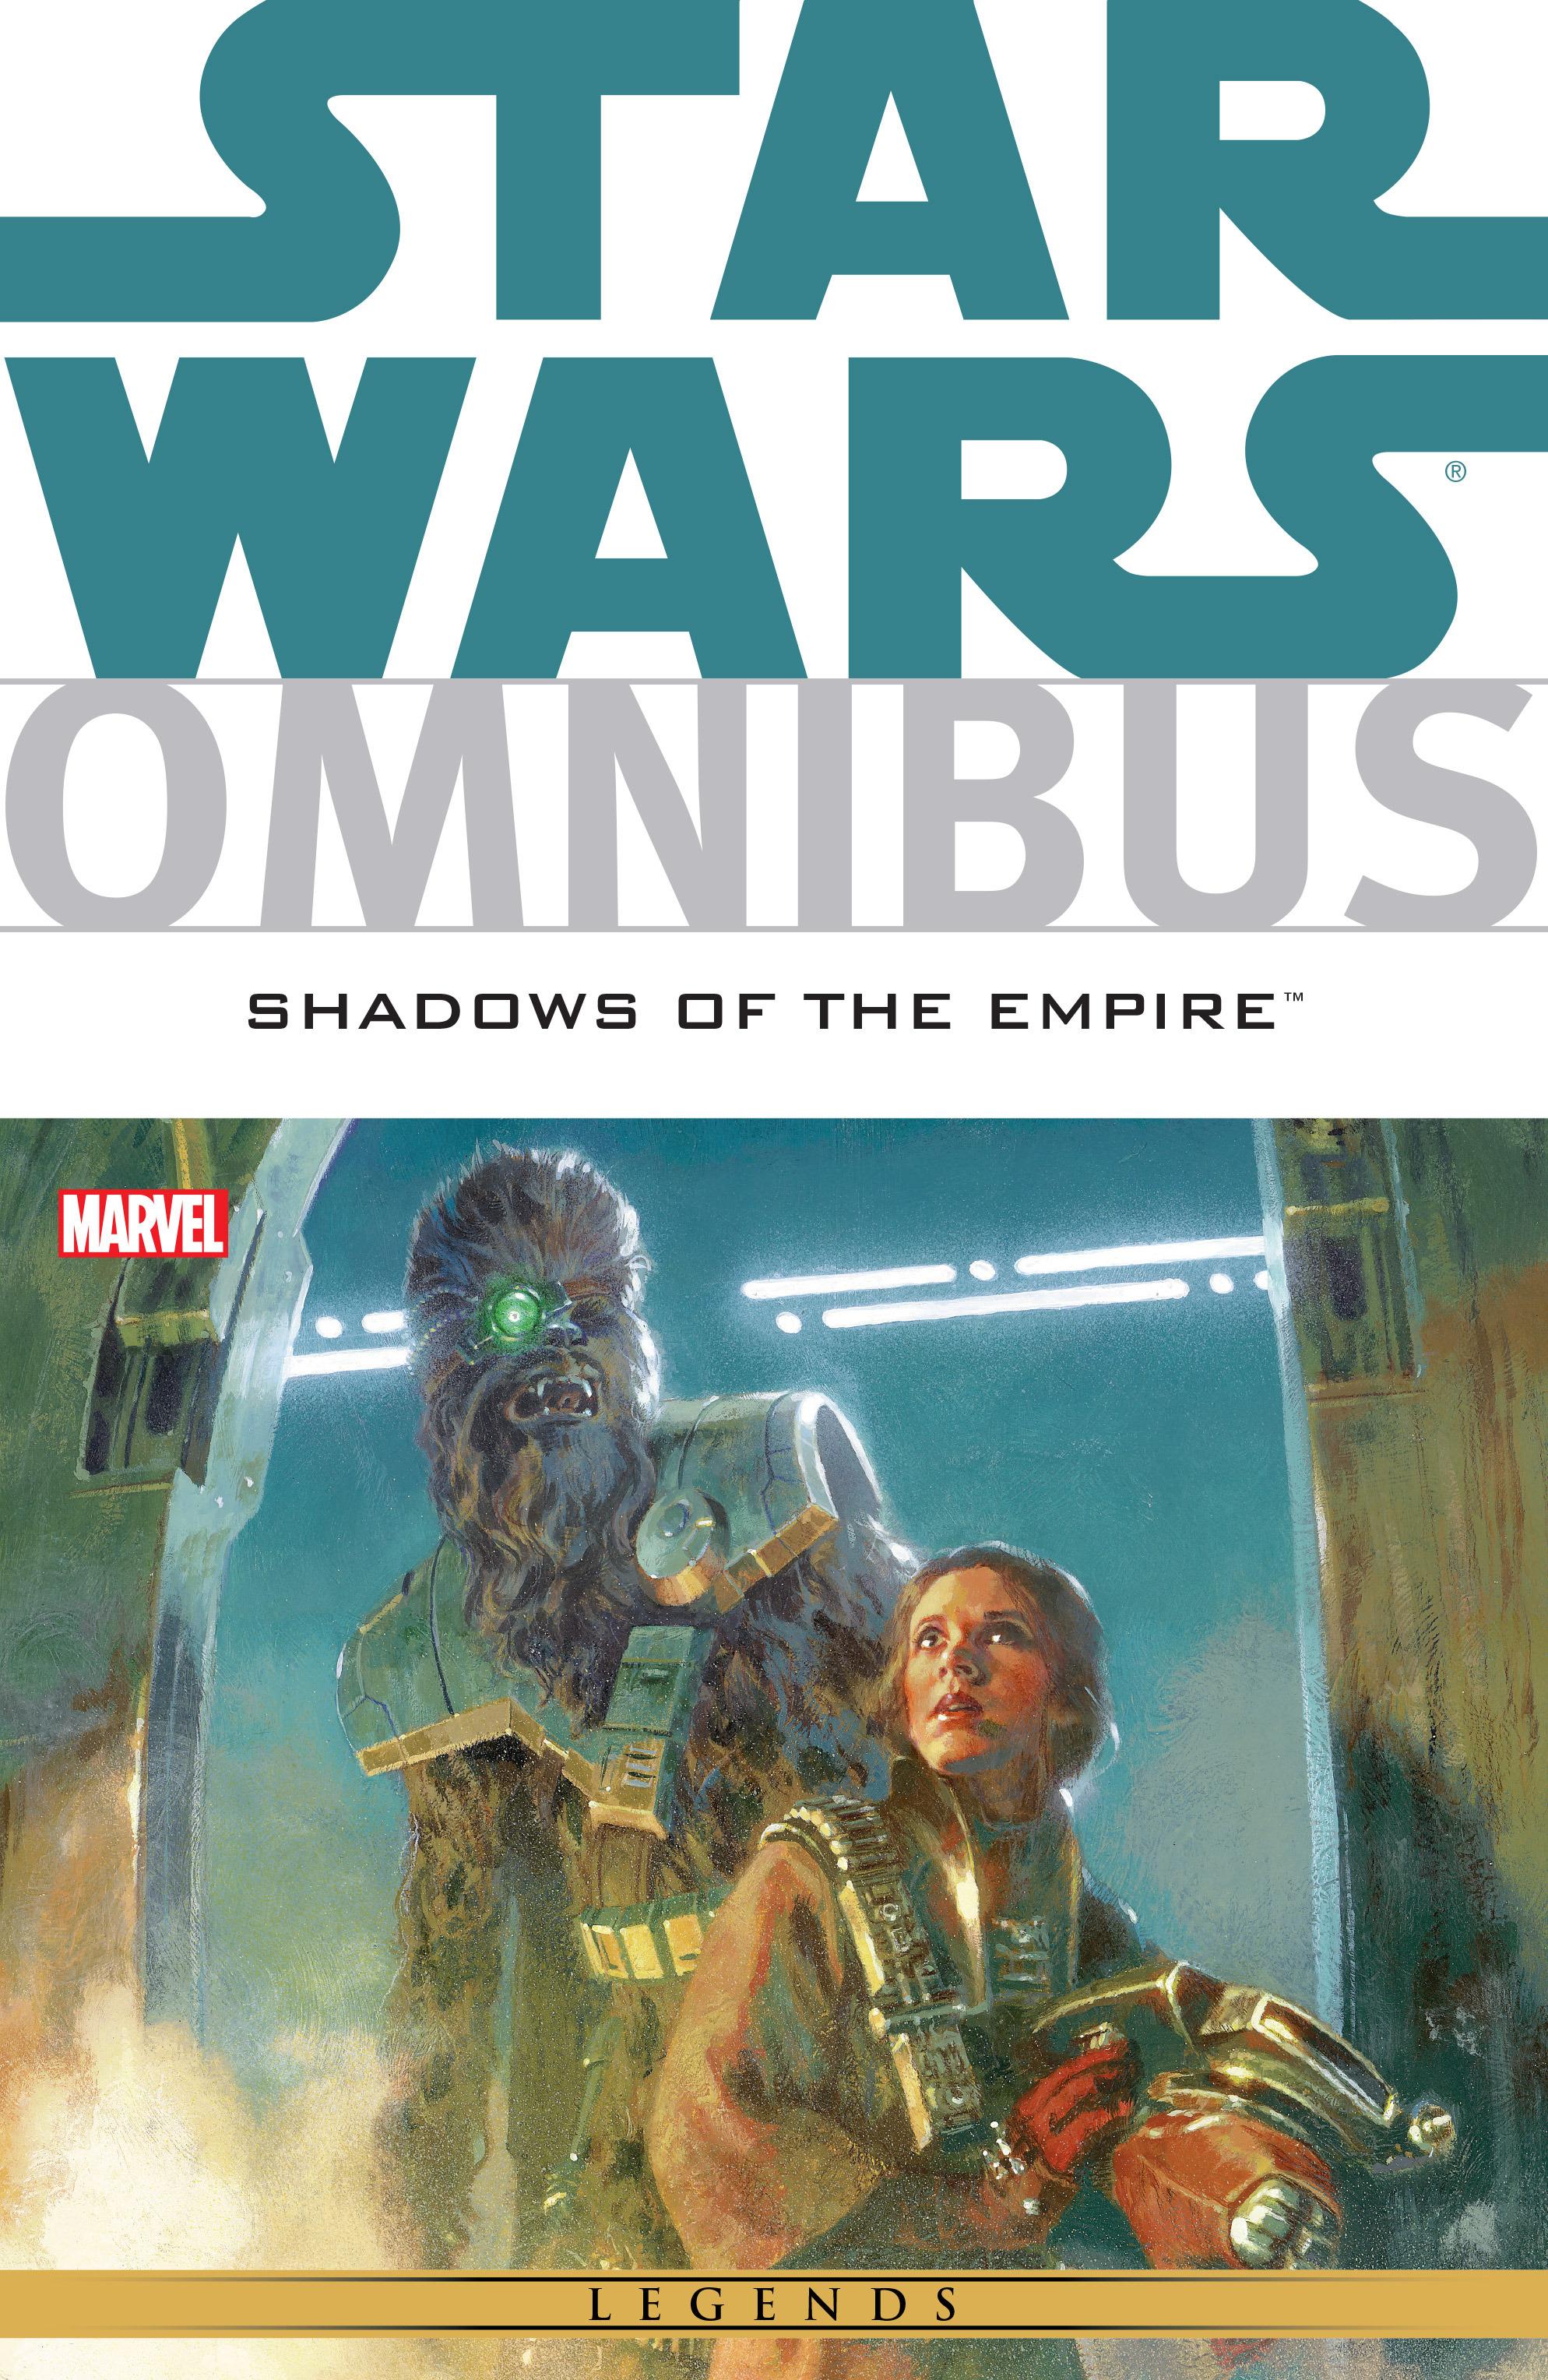 Read online Star Wars Omnibus comic -  Issue # Vol. 11 - 1